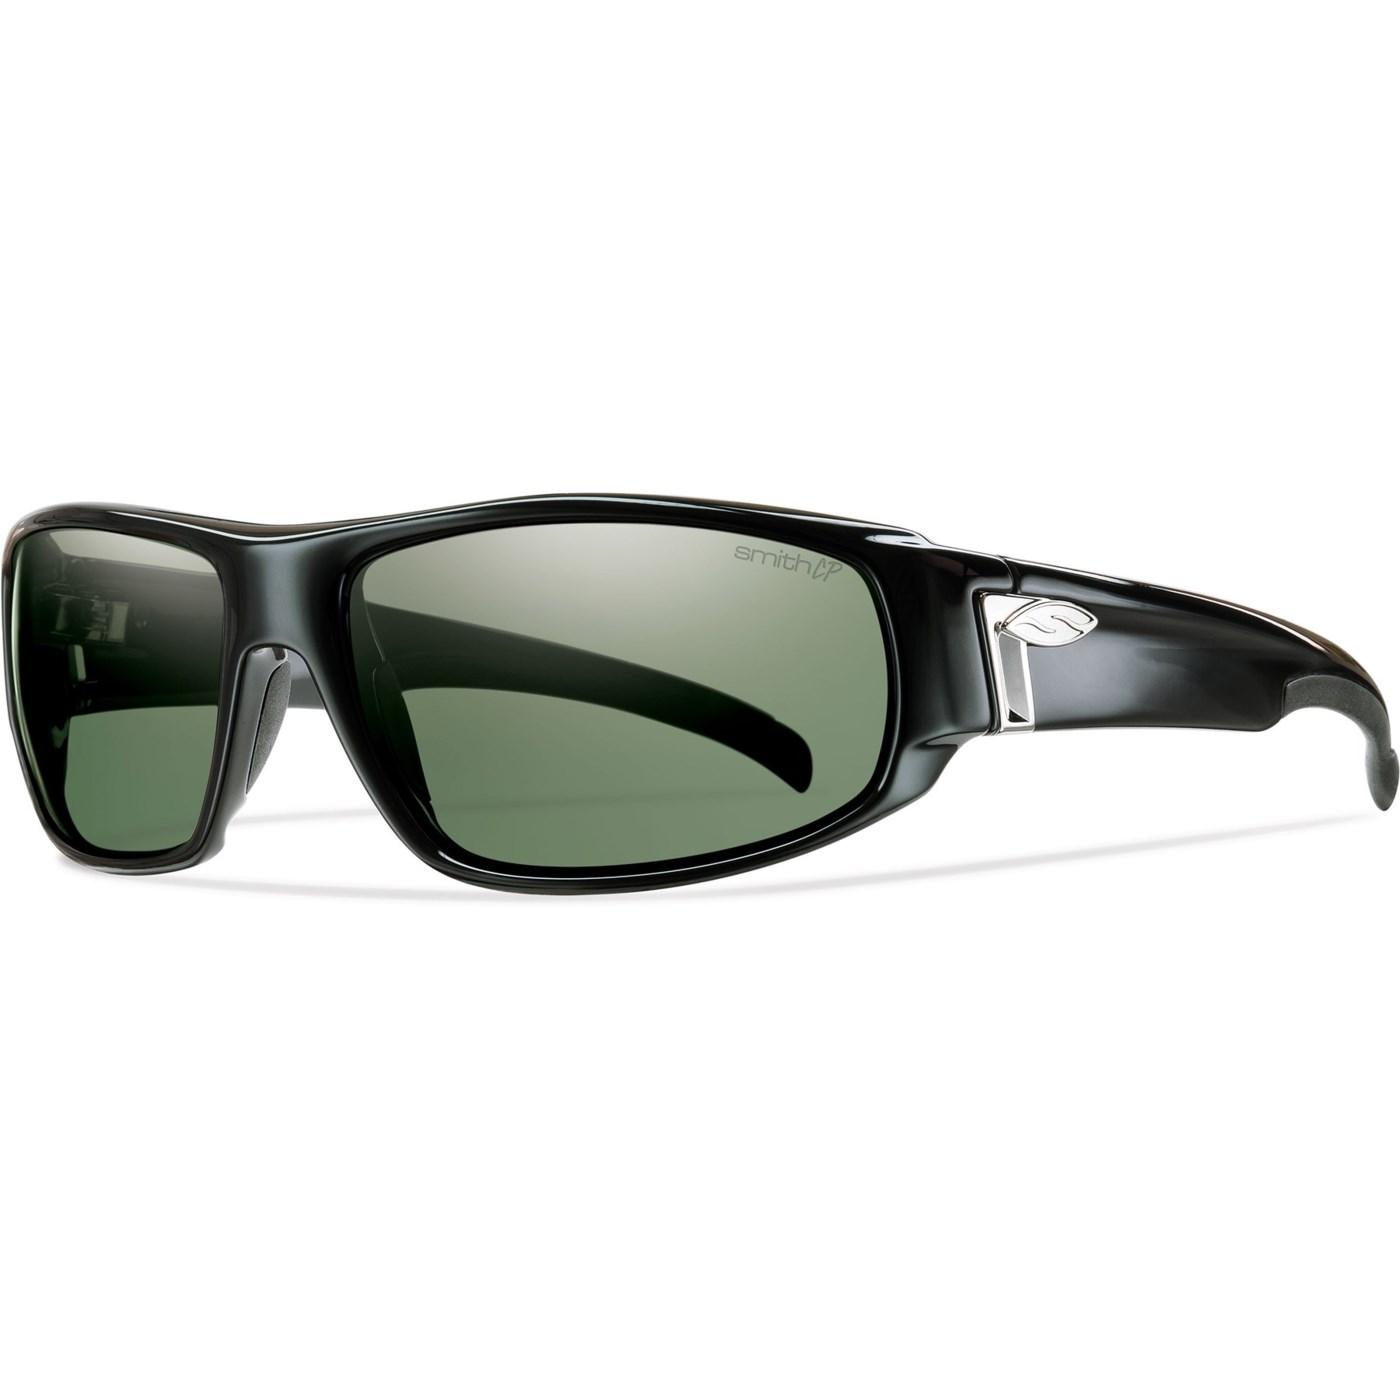 ca1c9630c8 Smith Optics Tenet Sunglasses ChromaPop Polarized Lenses 9836C 42 on ...